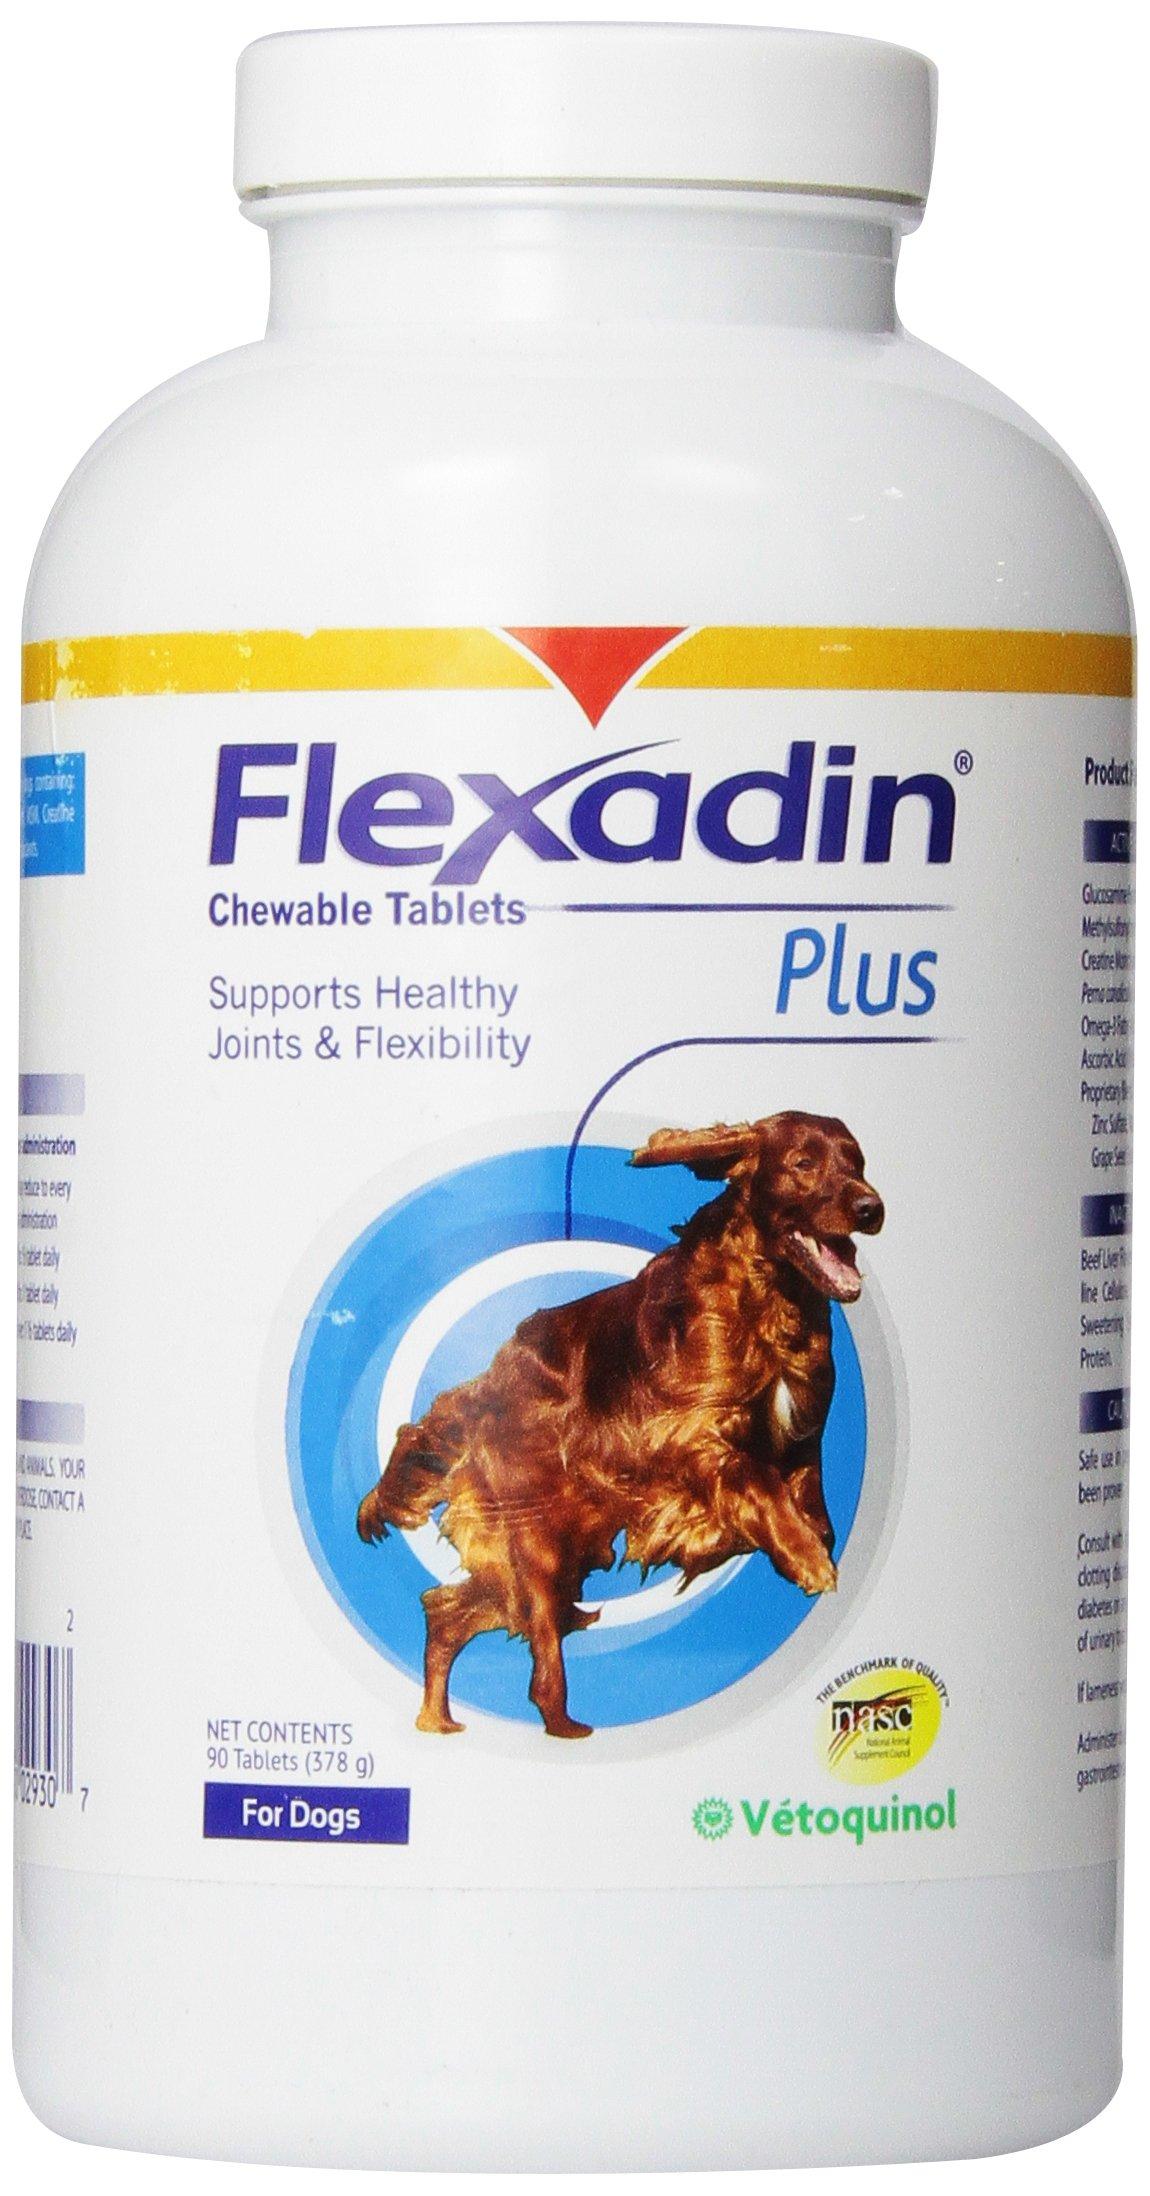 Vetoquinol Flexadin Plus Chewable Tablets for Dogs 90 Ct by Vetoquinol